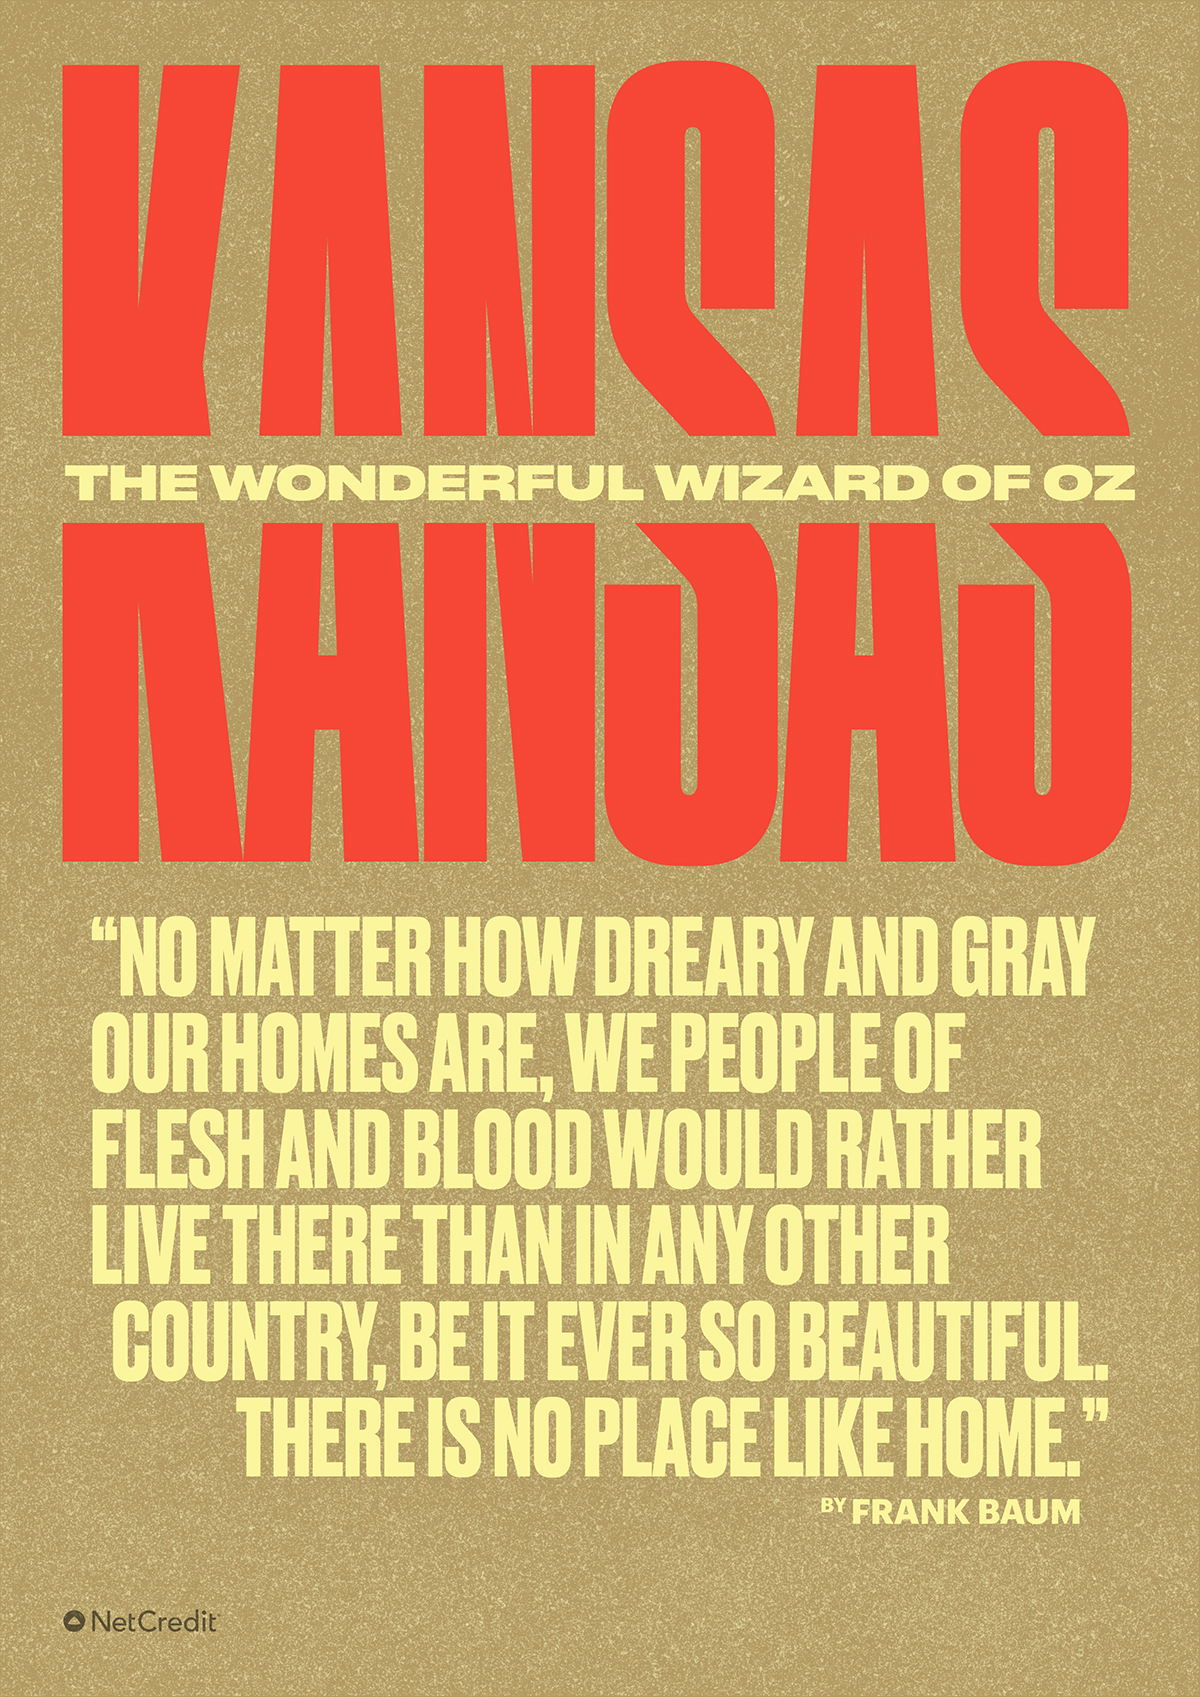 Wonderful Wizard of Oz Kansas